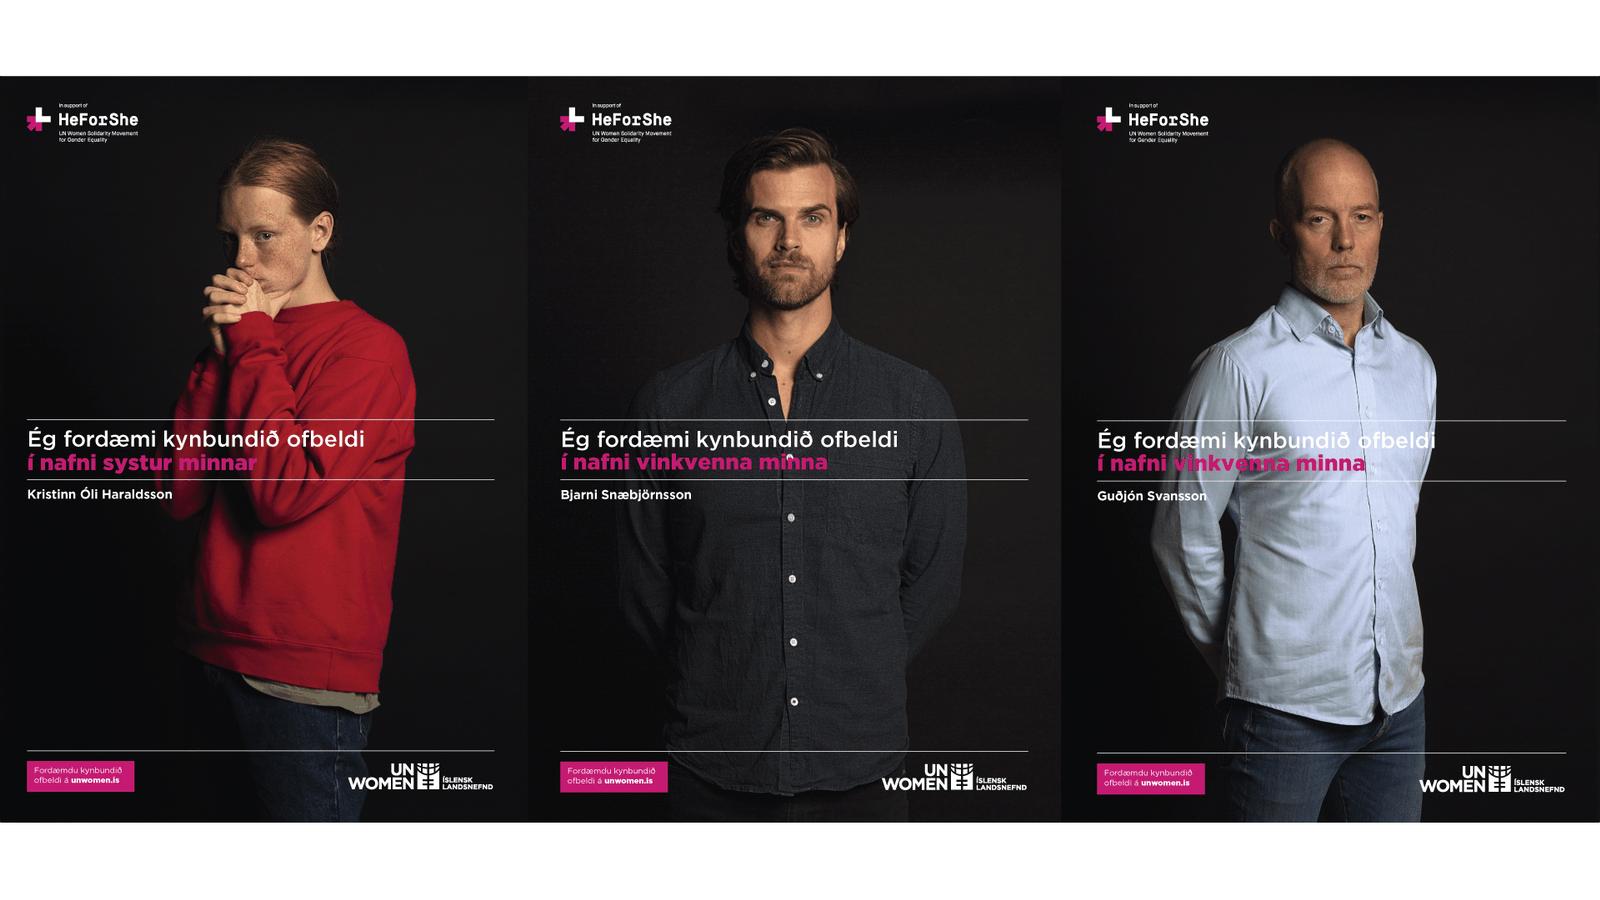 HeForShe veggspjald2 fyrir UN WOMEN